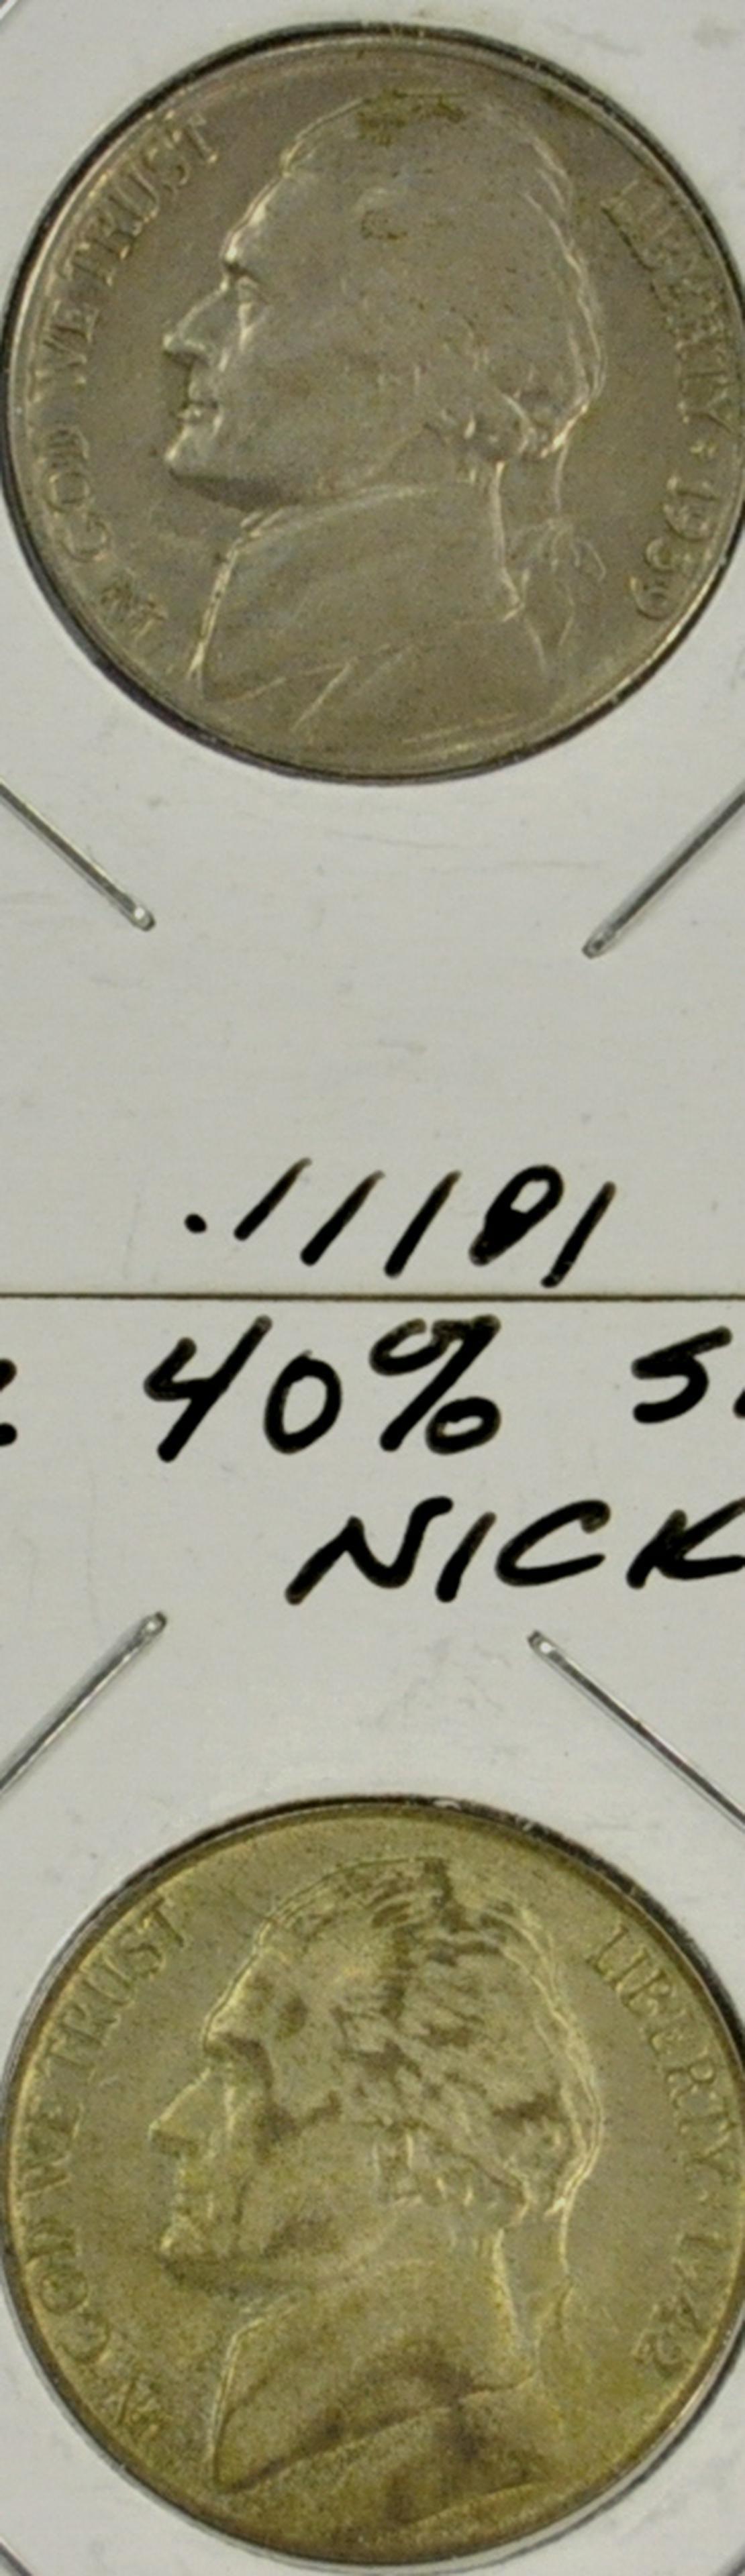 "1939 / 1942 ""P"" Jefferson Nickels"